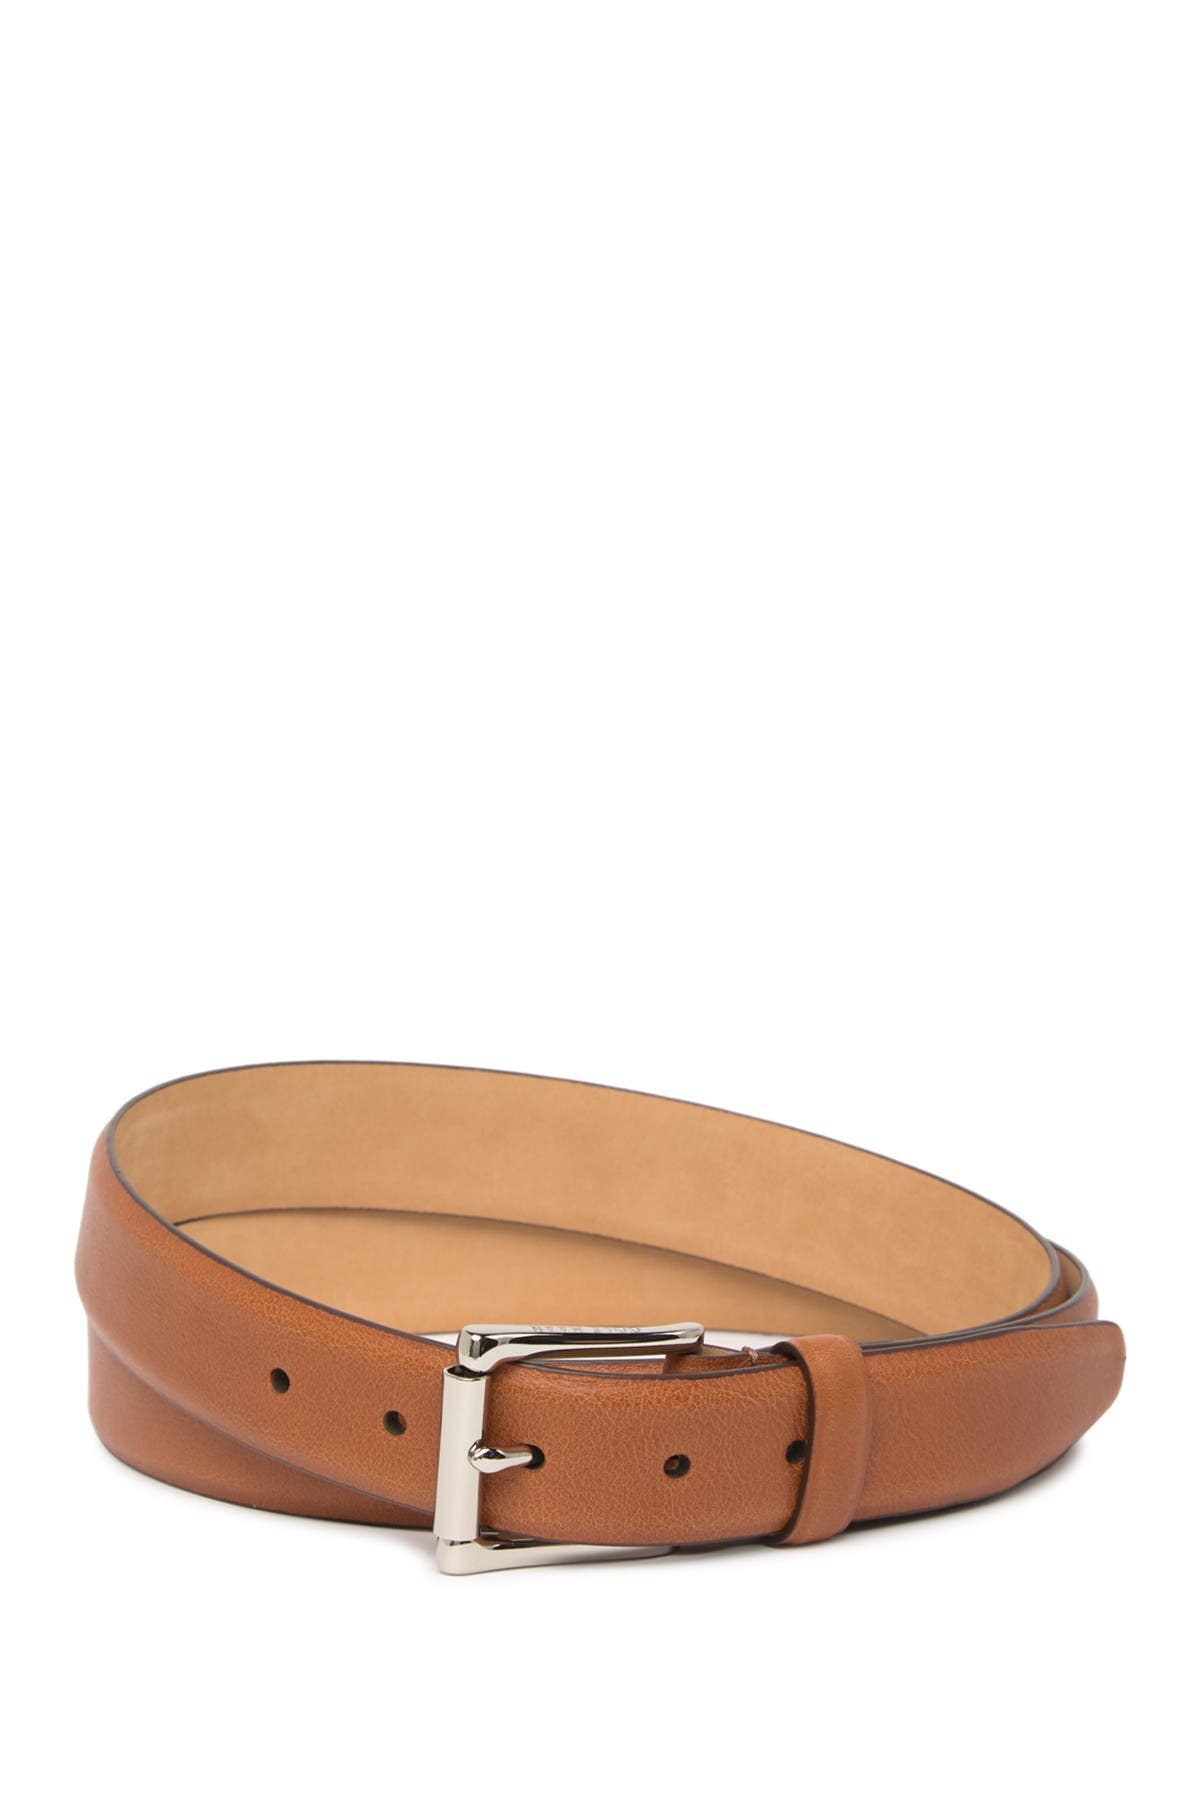 Image of Cole Haan 32mm Leather Dress Belt